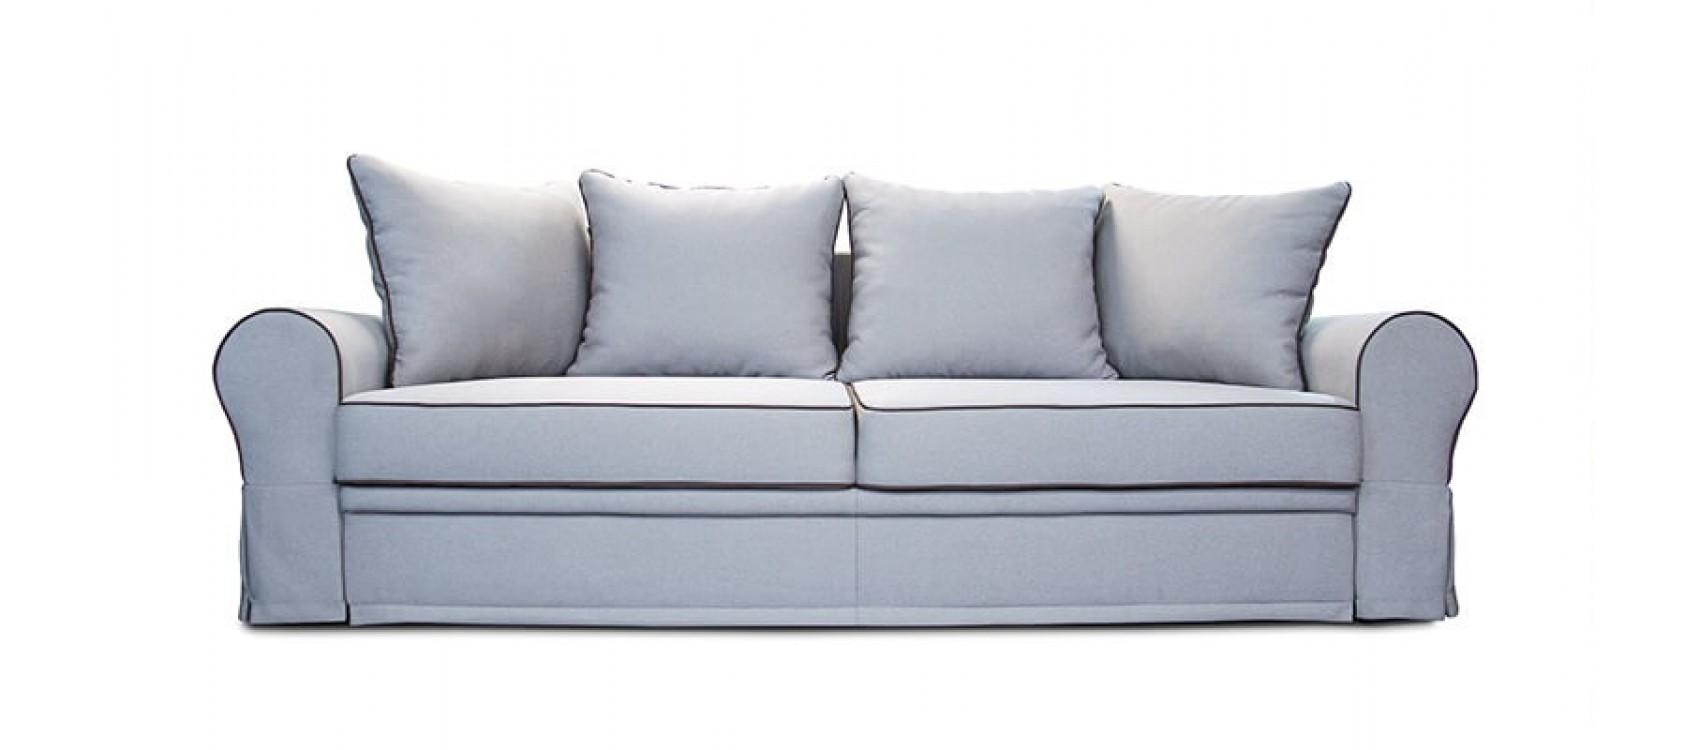 Sofa ALICE foto 13